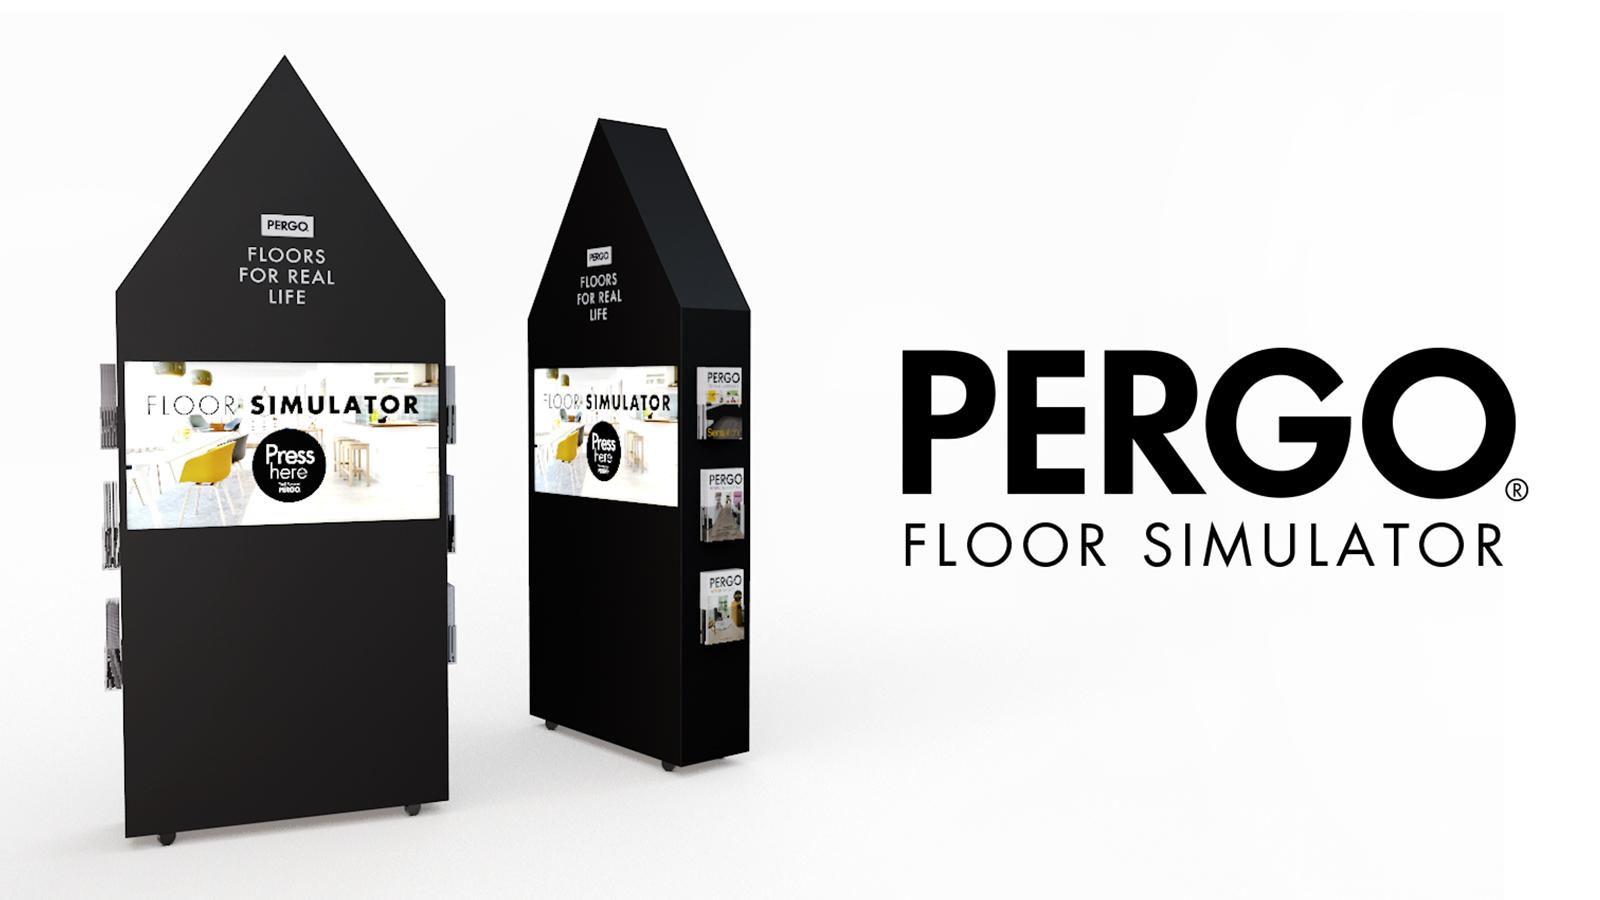 PERGO-conceptstore_0006_PERGO.jpg